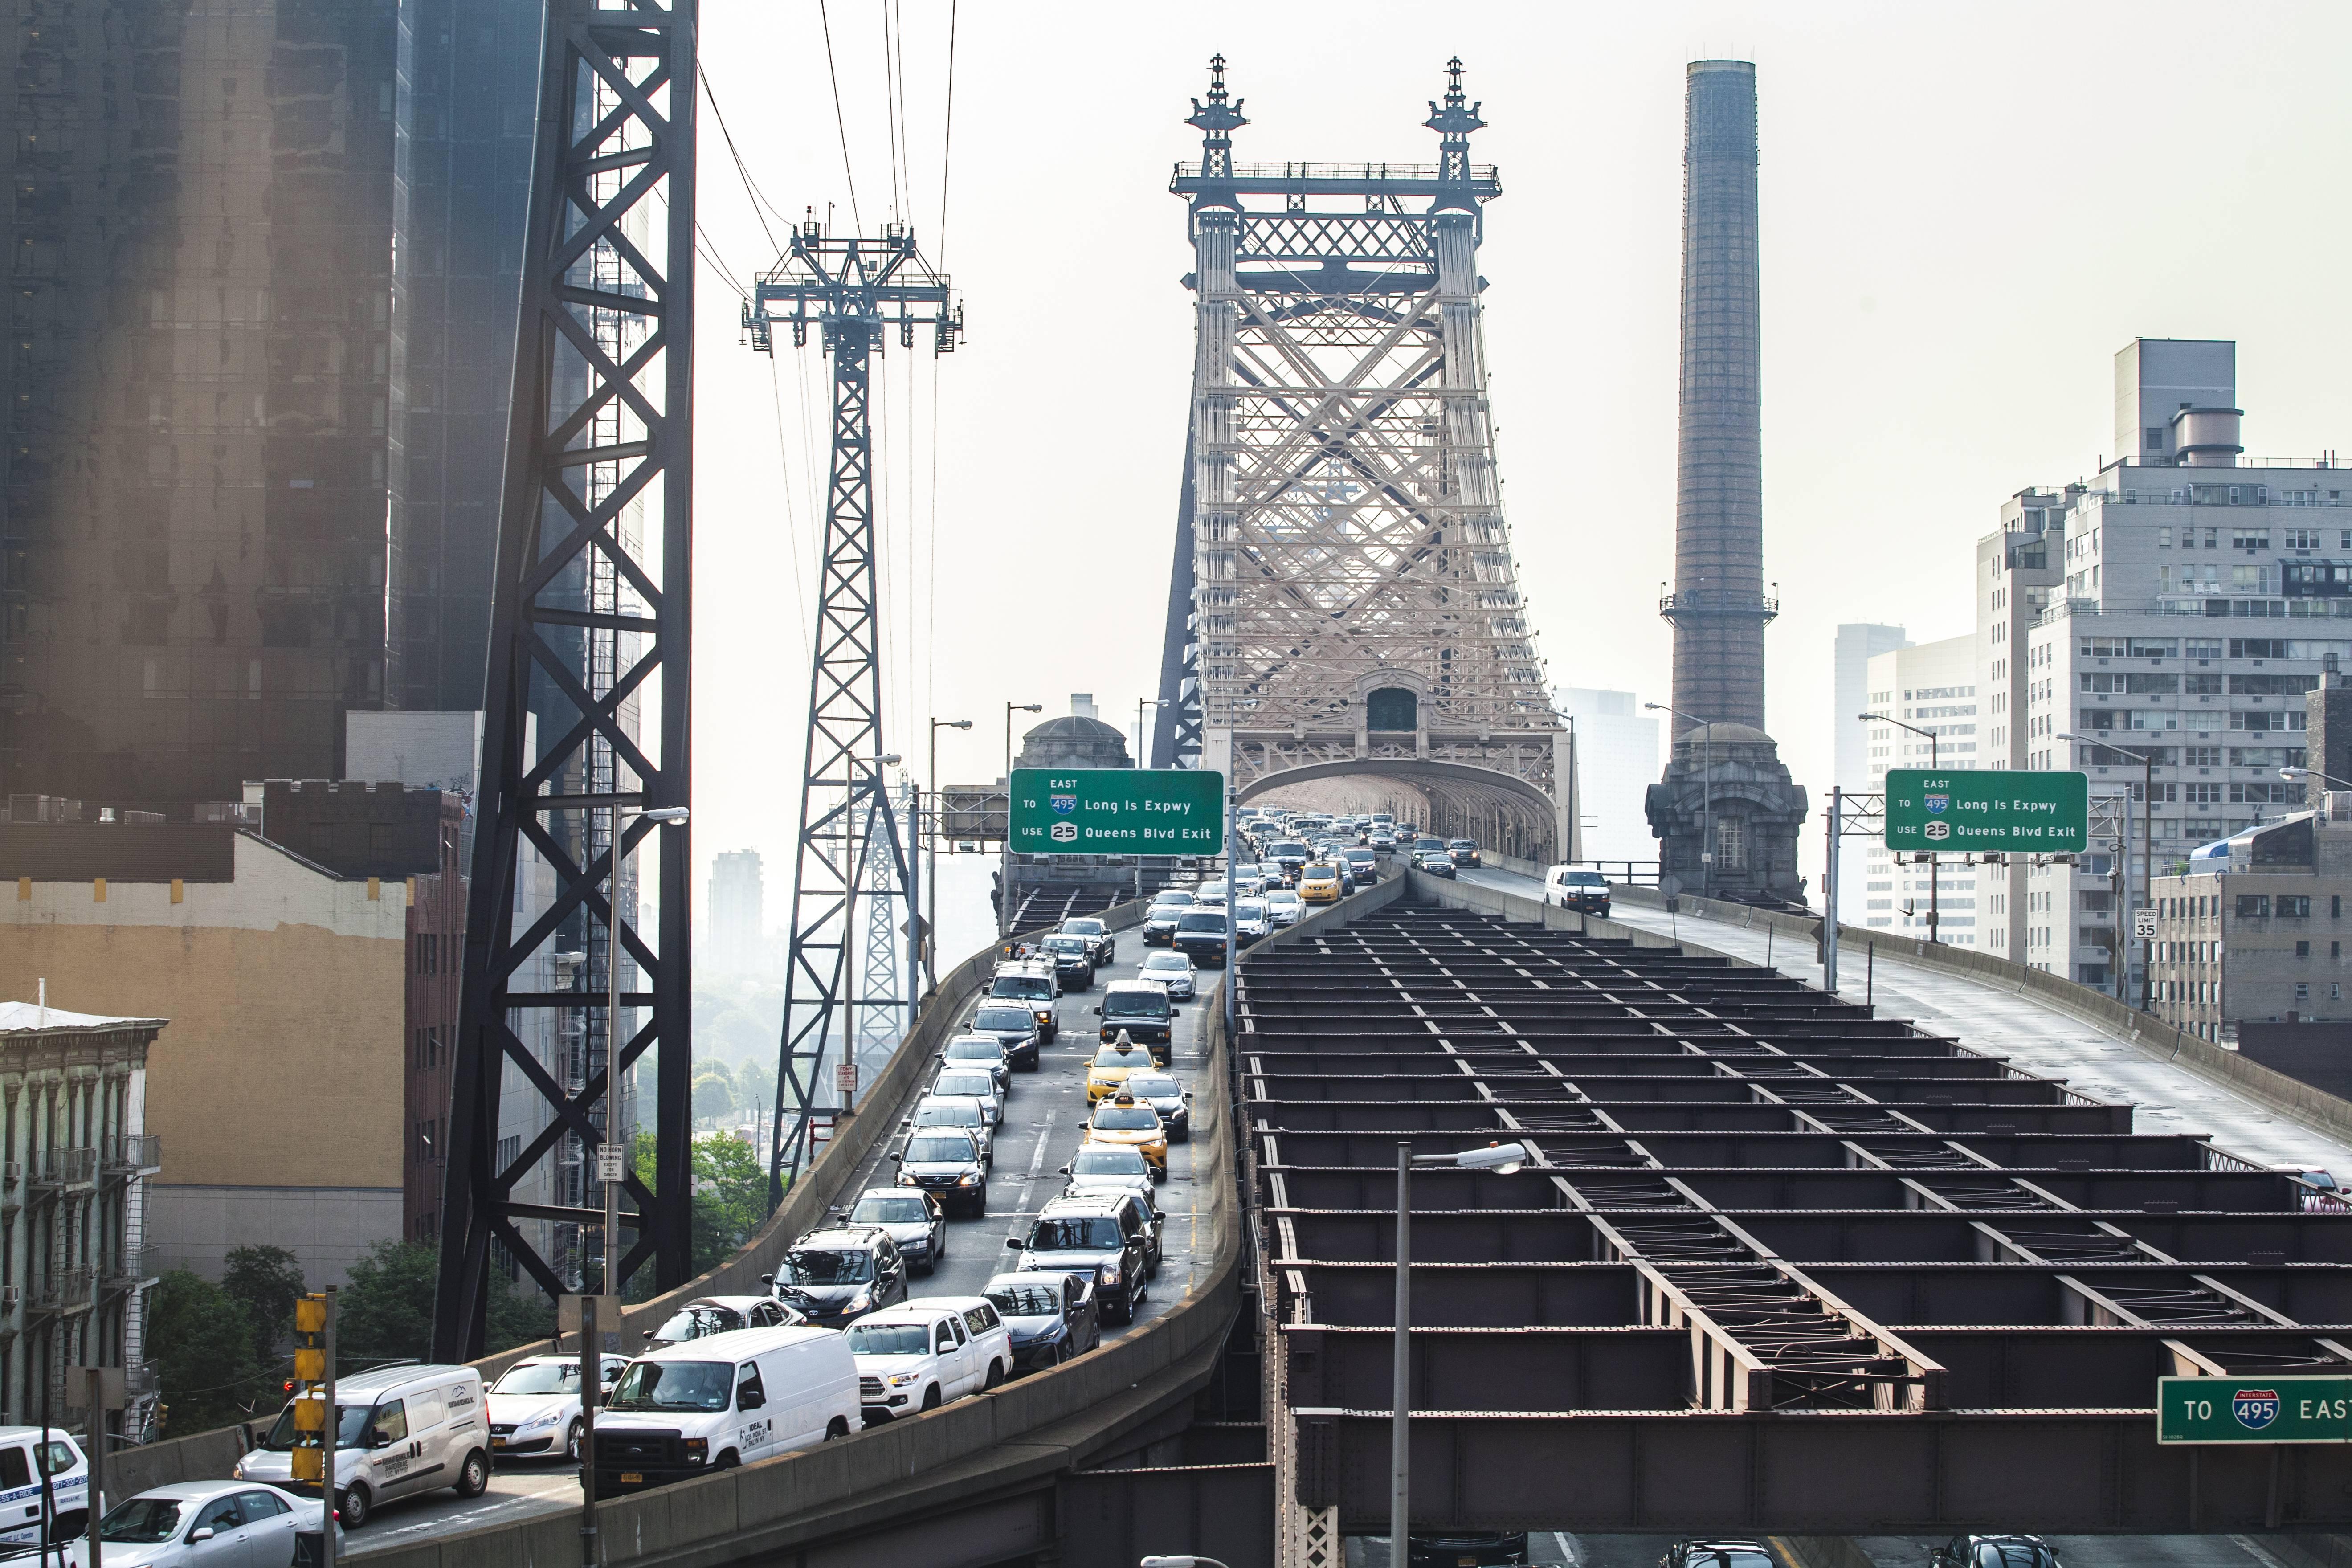 Trânsito em Nova York. Foto: Bigstock